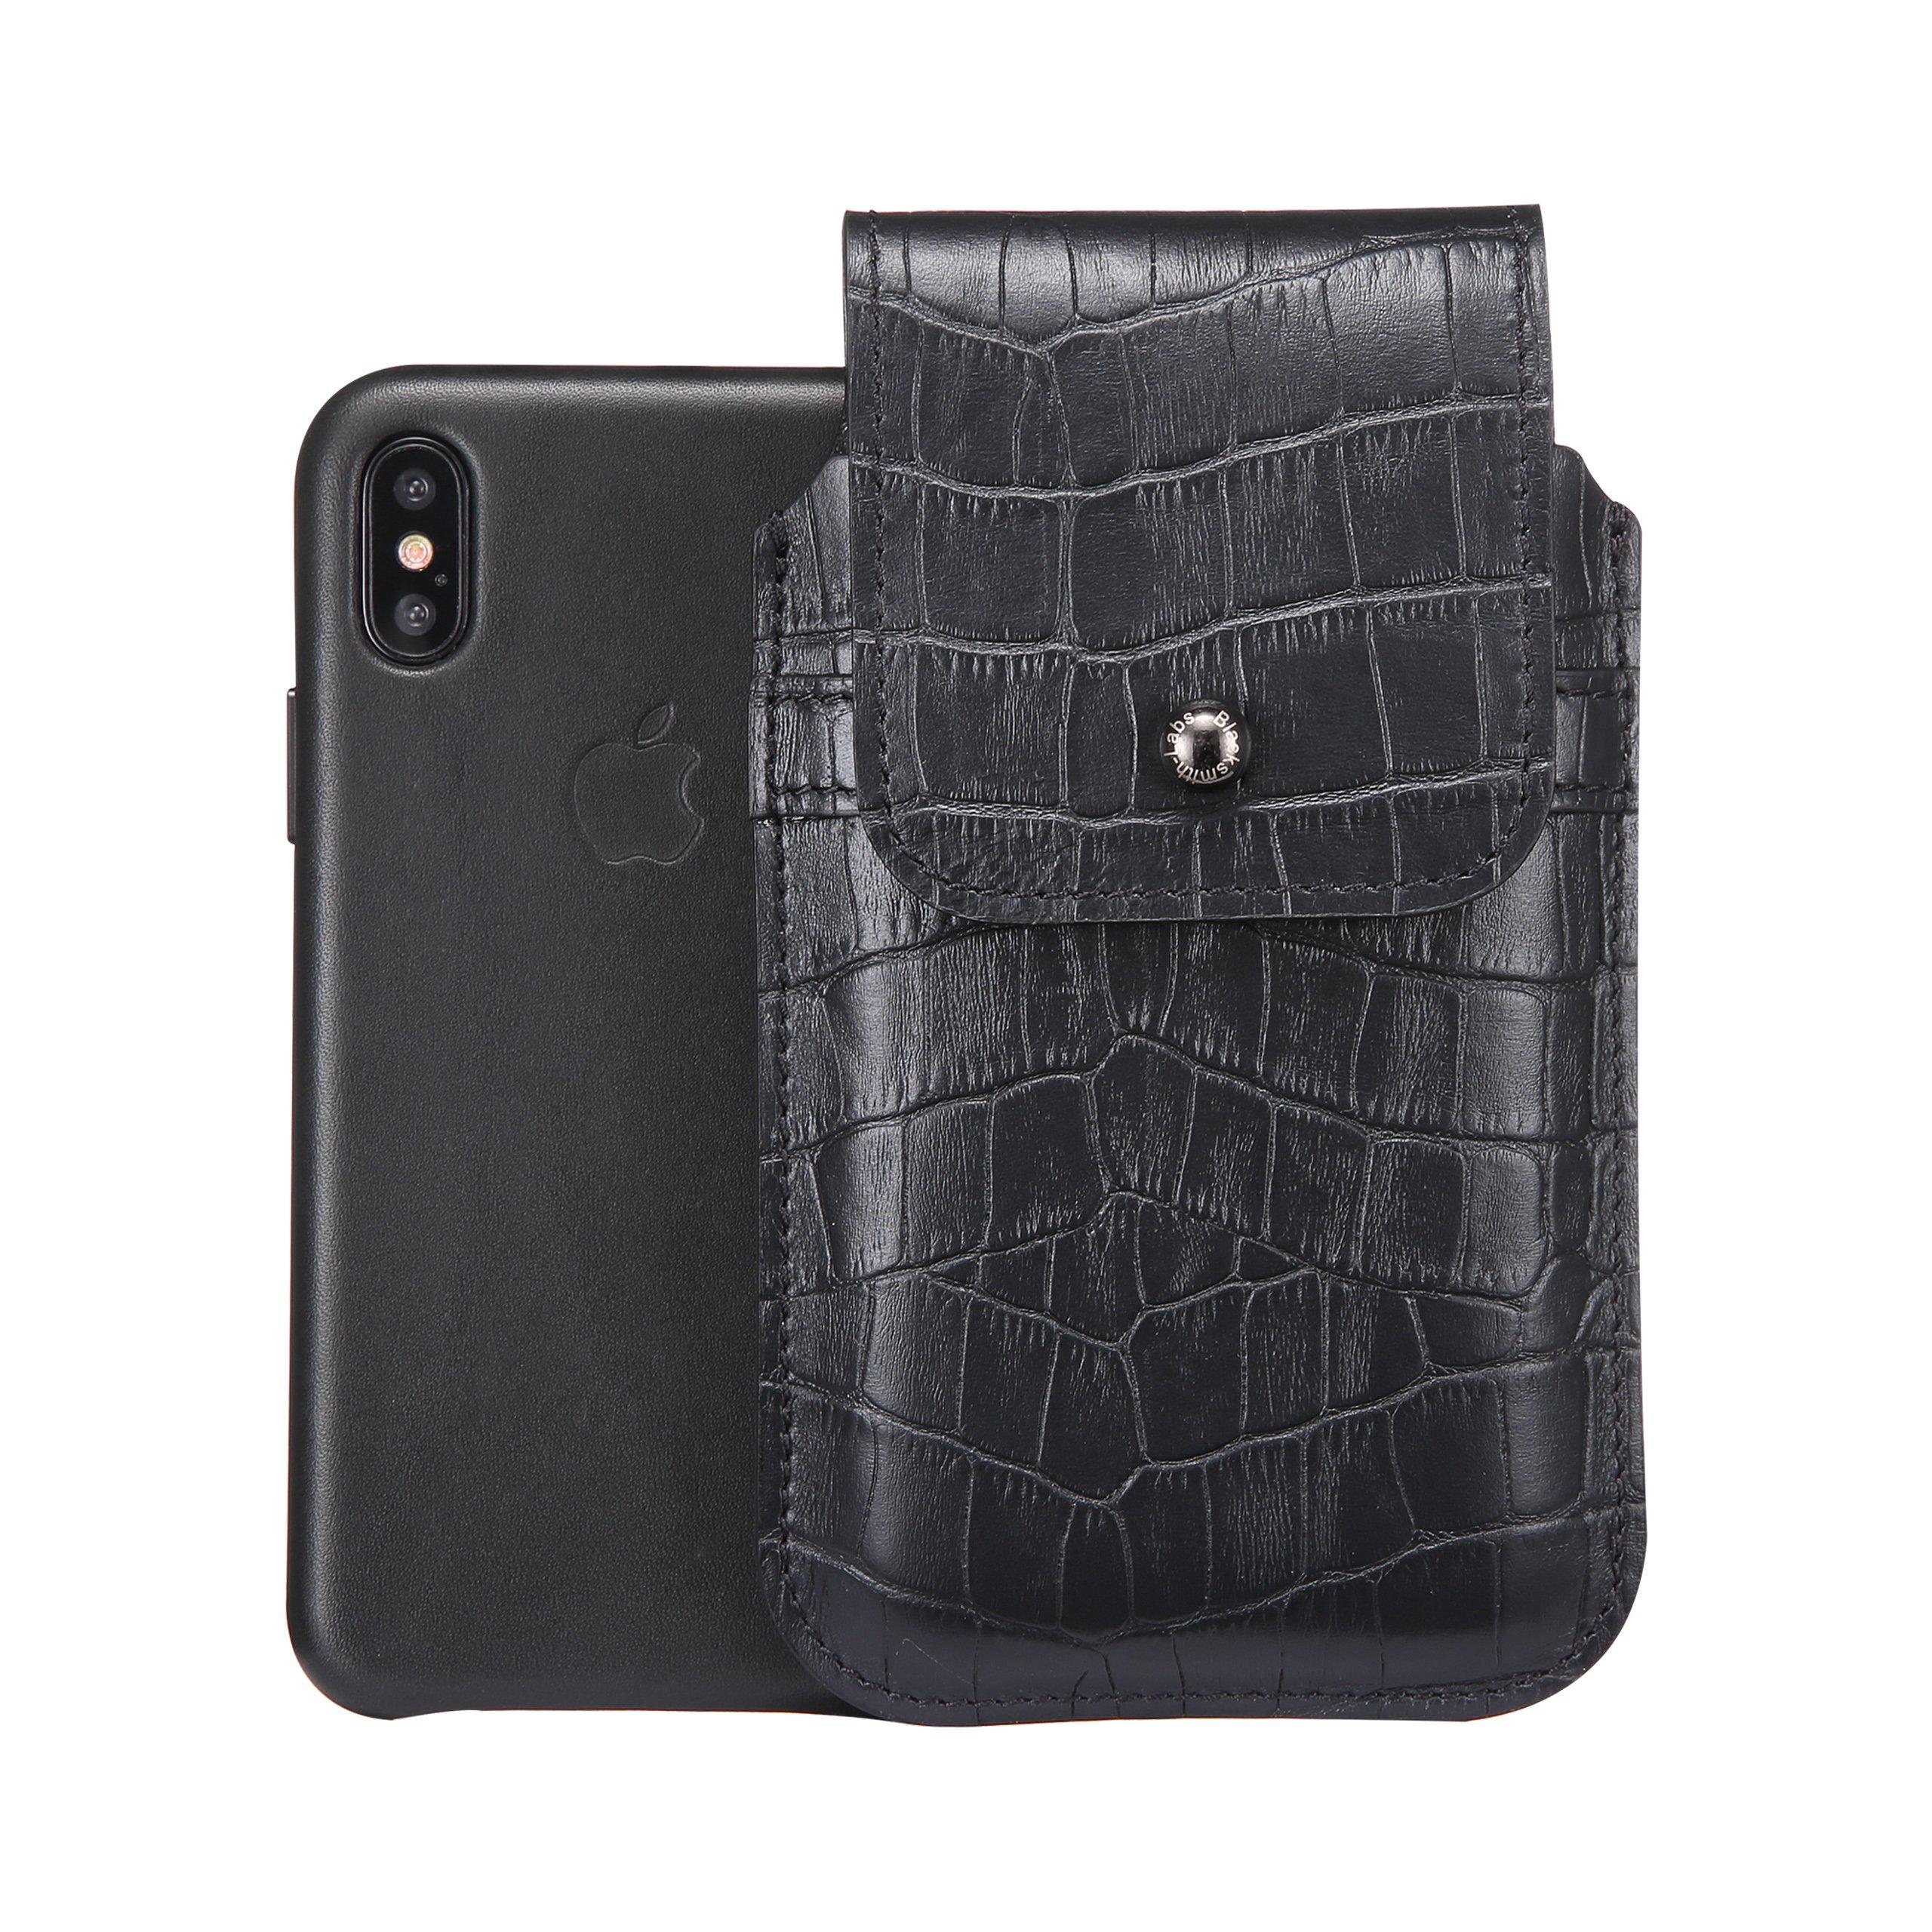 Blacksmith-Labs Barrett Mezzano 2017 Premium Oversized Genuine Leather Swivel Belt Clip Holster for Apple iPhone X for use with Apple Leather Case - Black Croc Embossed Cowhide, Gunmetal Belt Clip